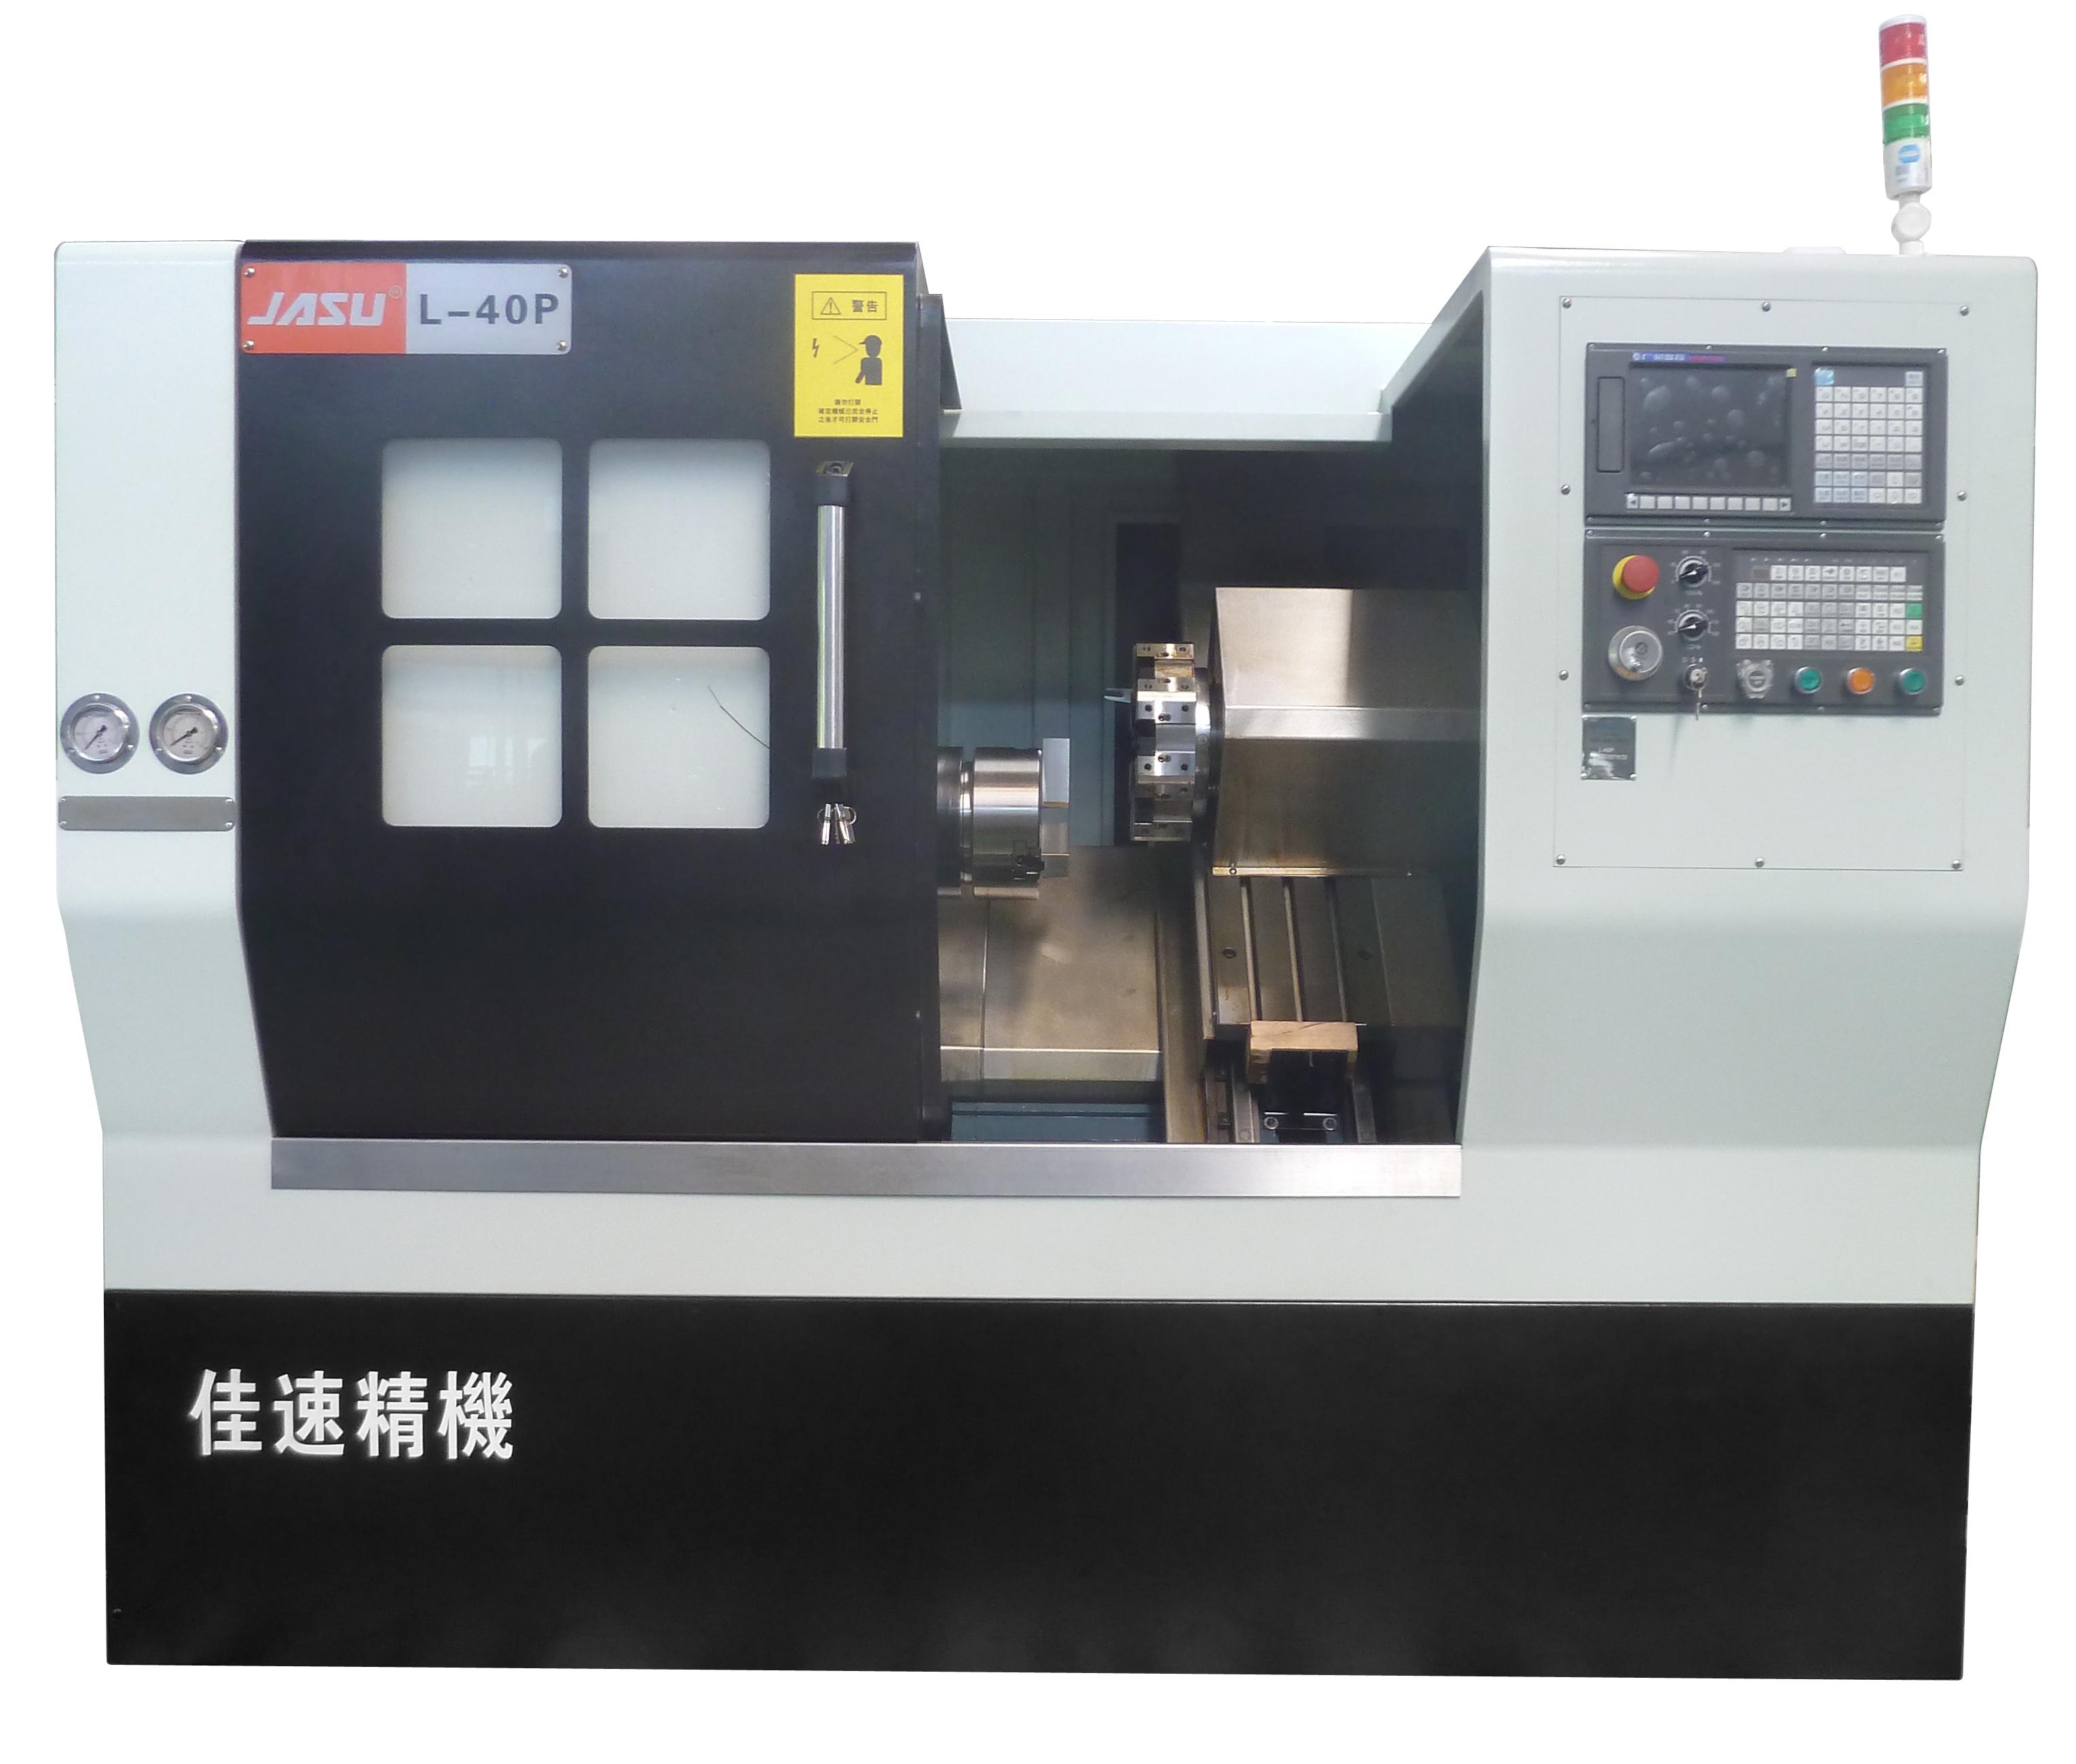 L-40P Horizontal CNC Lathe